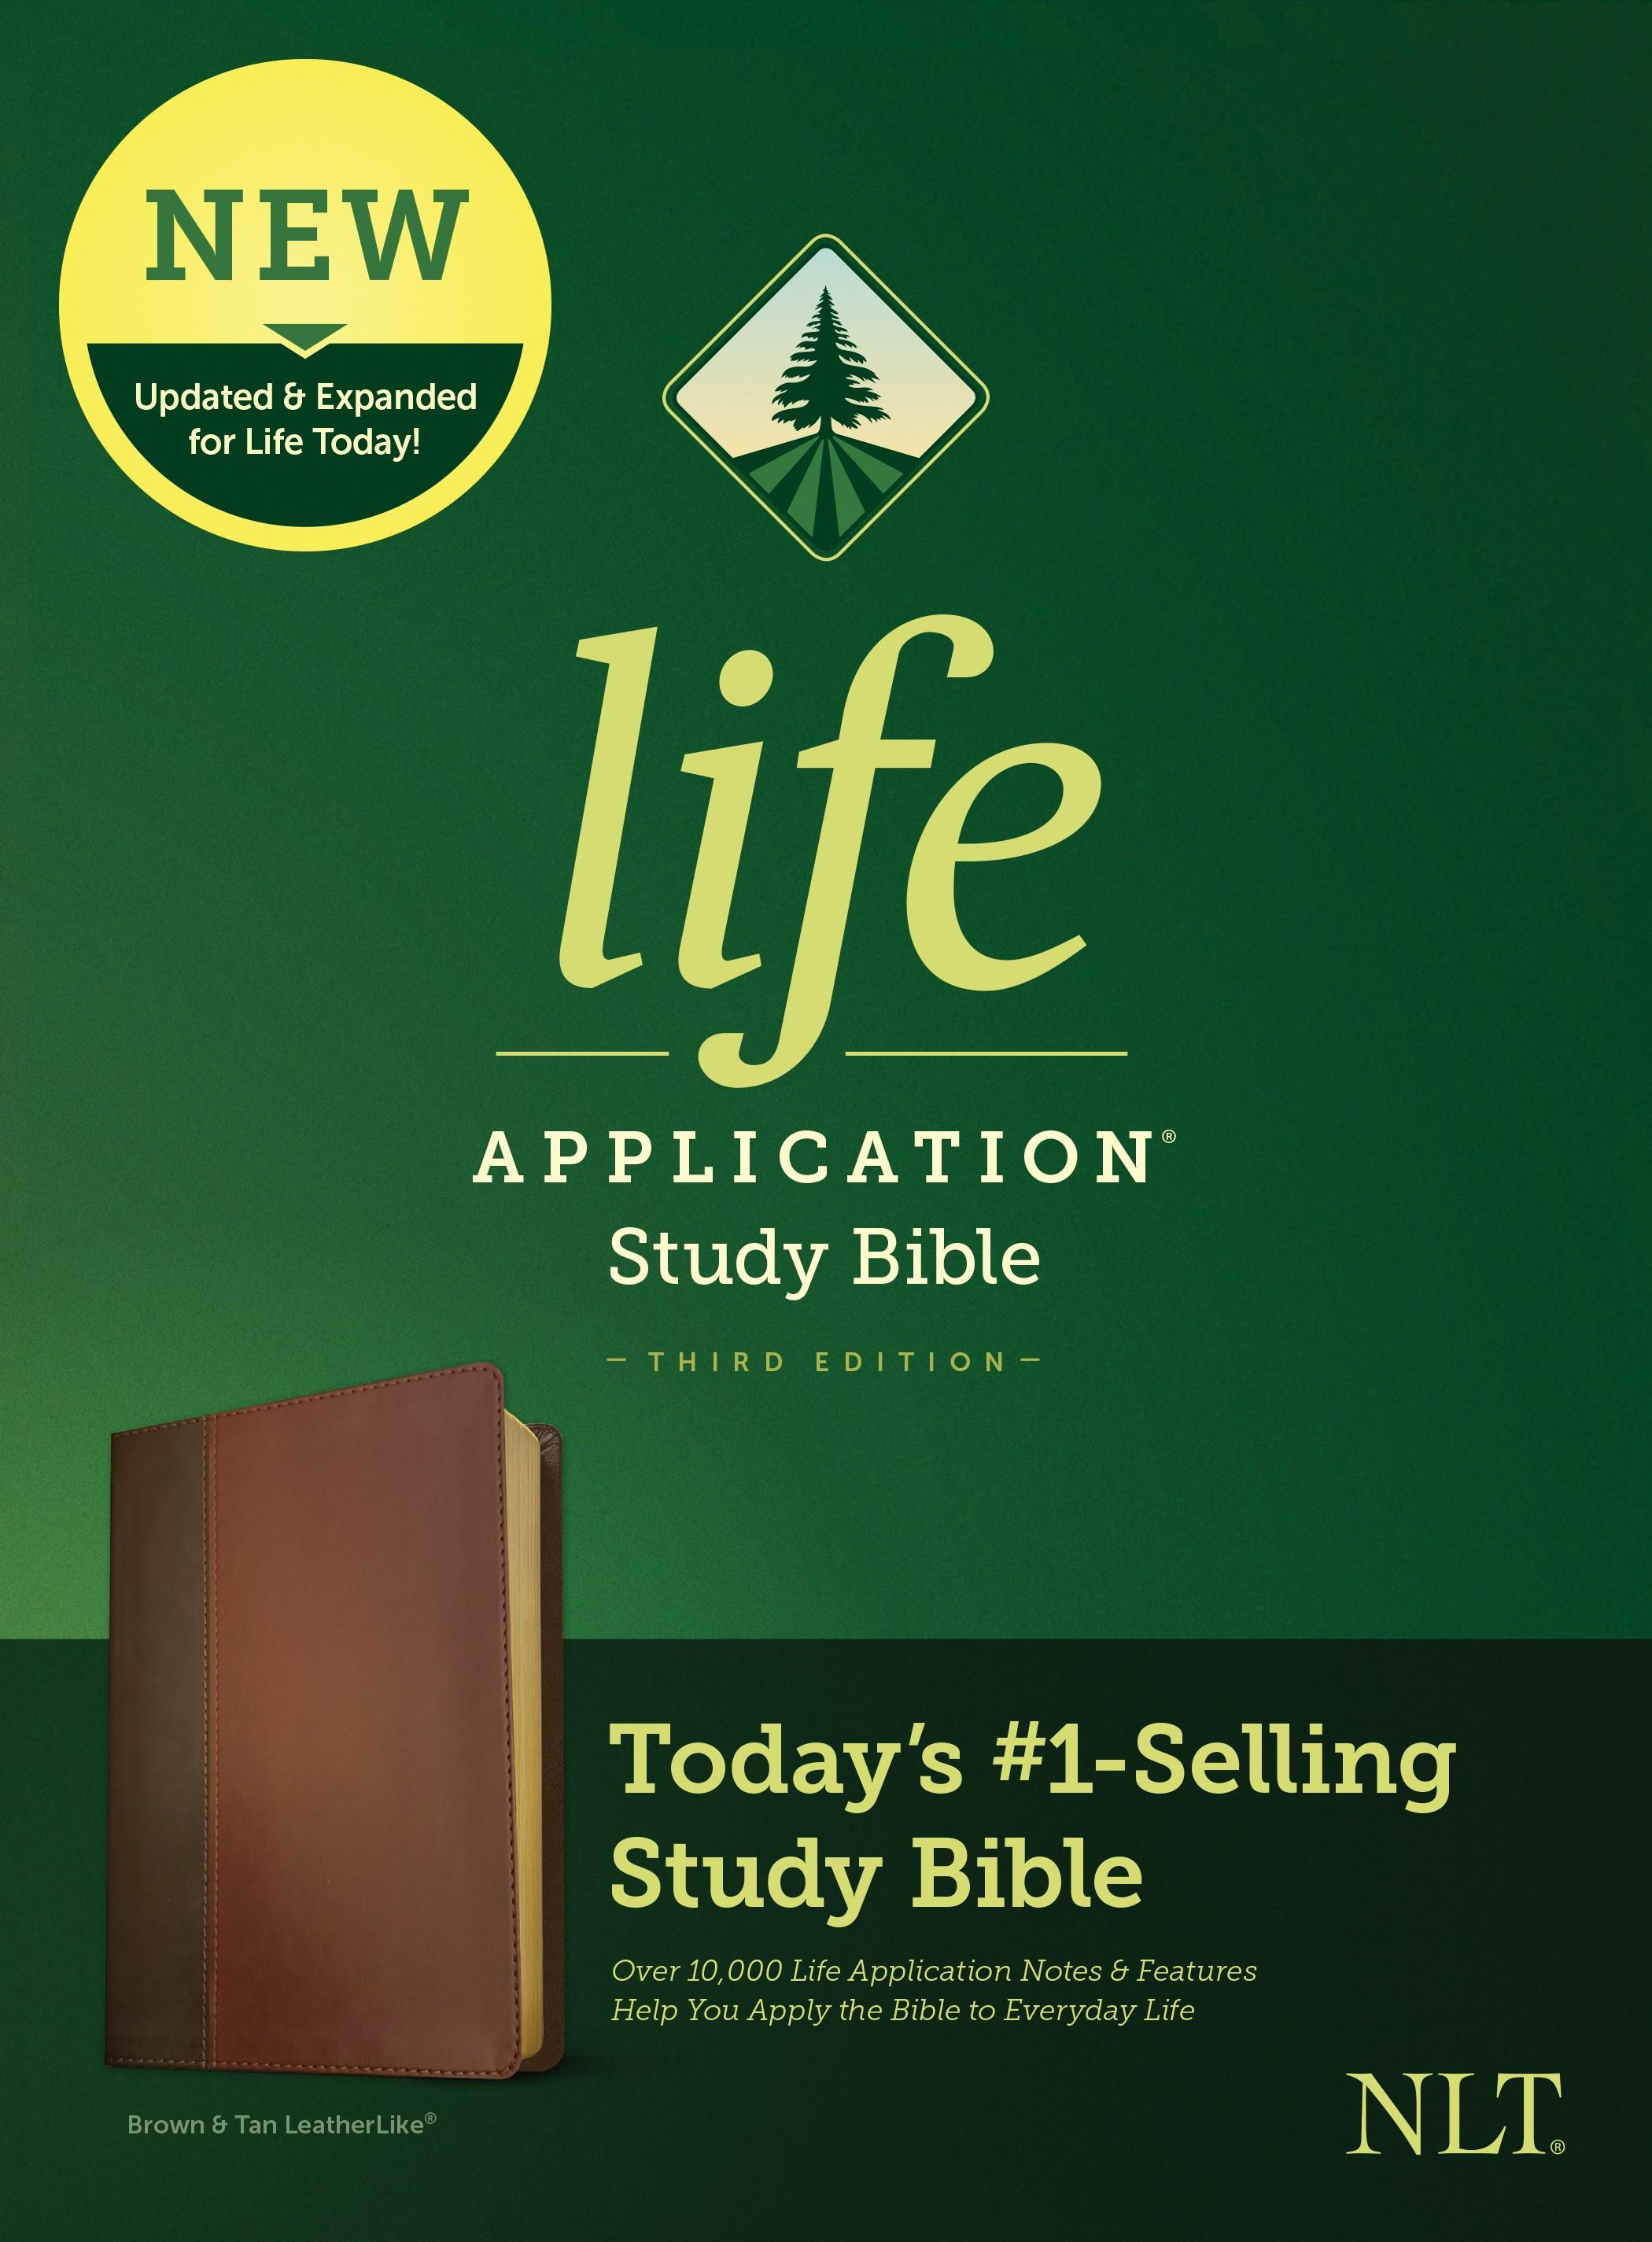 NLT Life Application Study Bible (Third Edition)-Brown/Tan LeatherLike